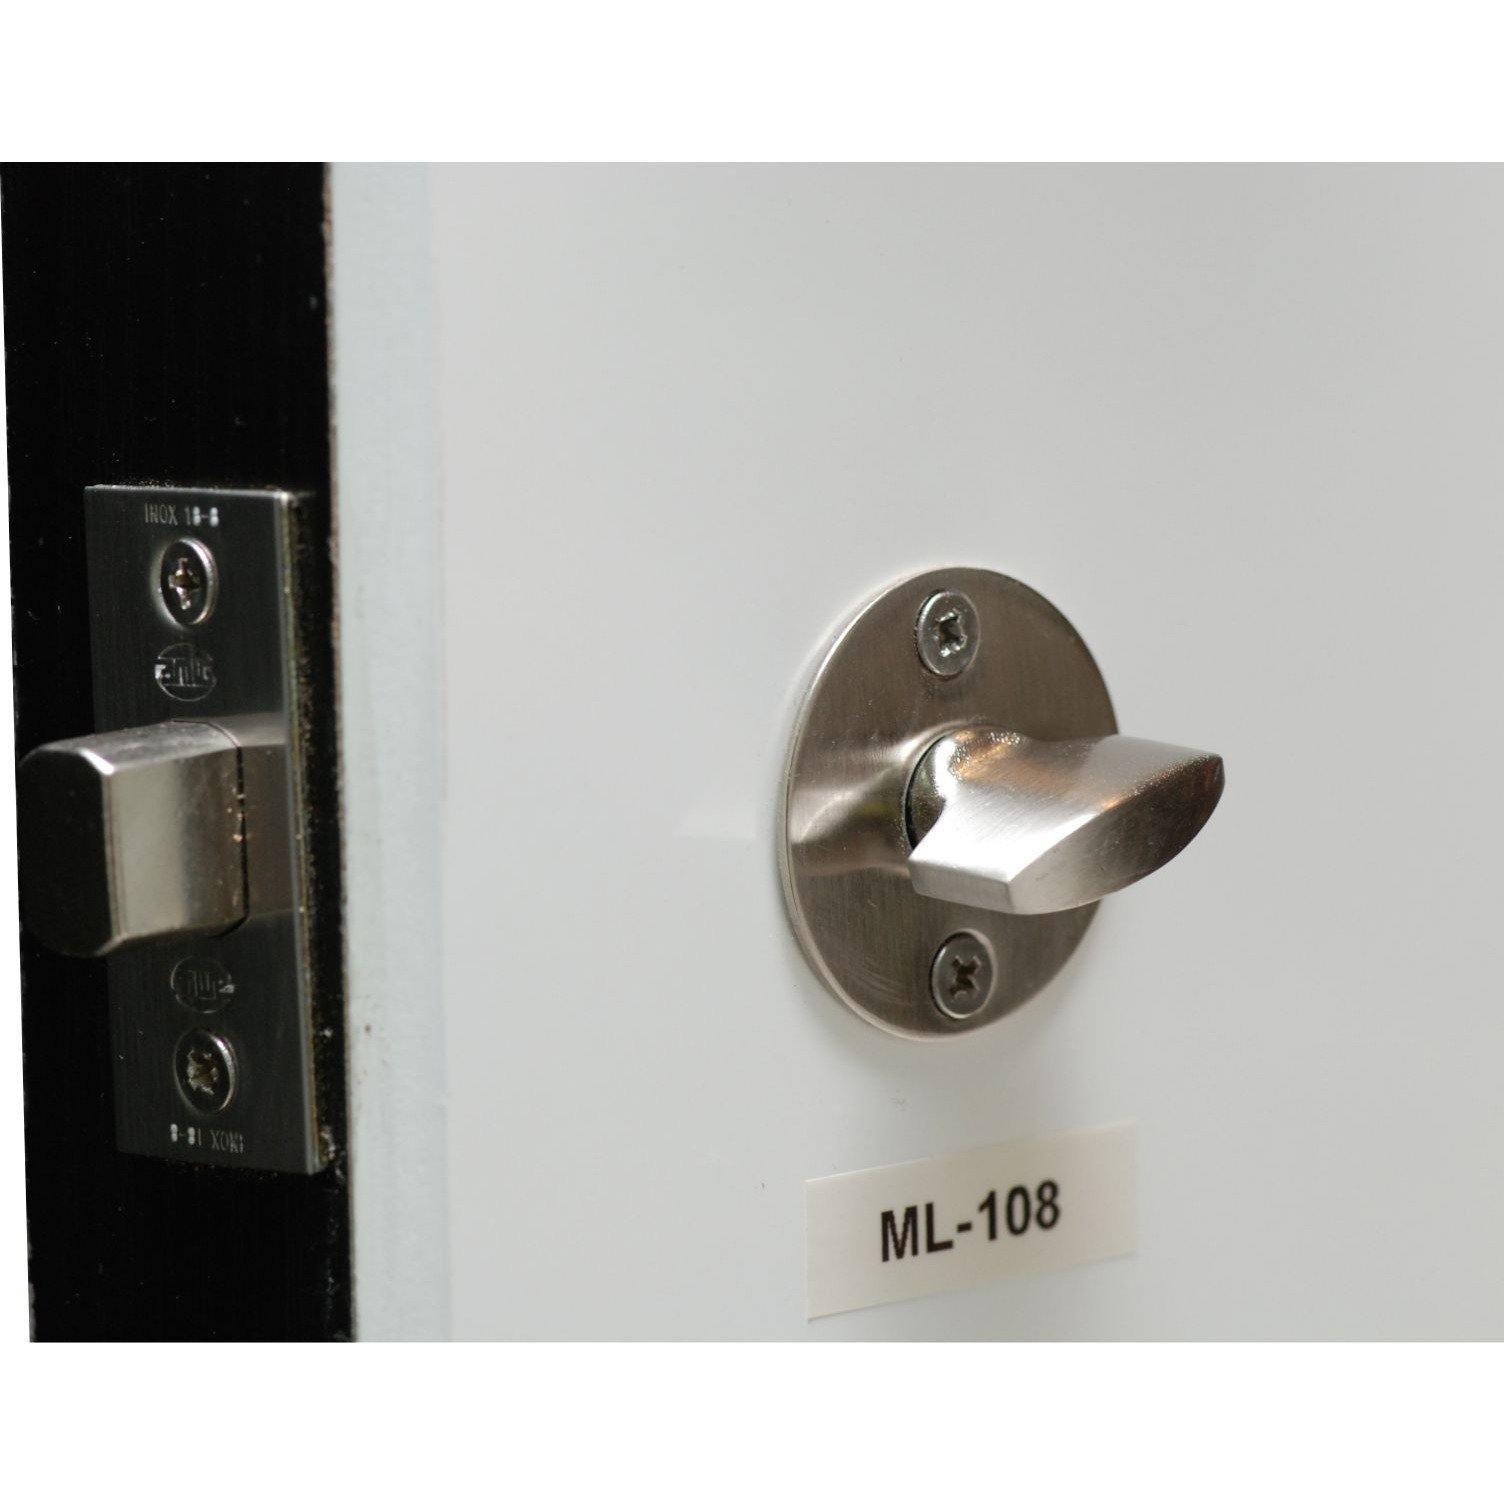 One sided deadbolt with knob